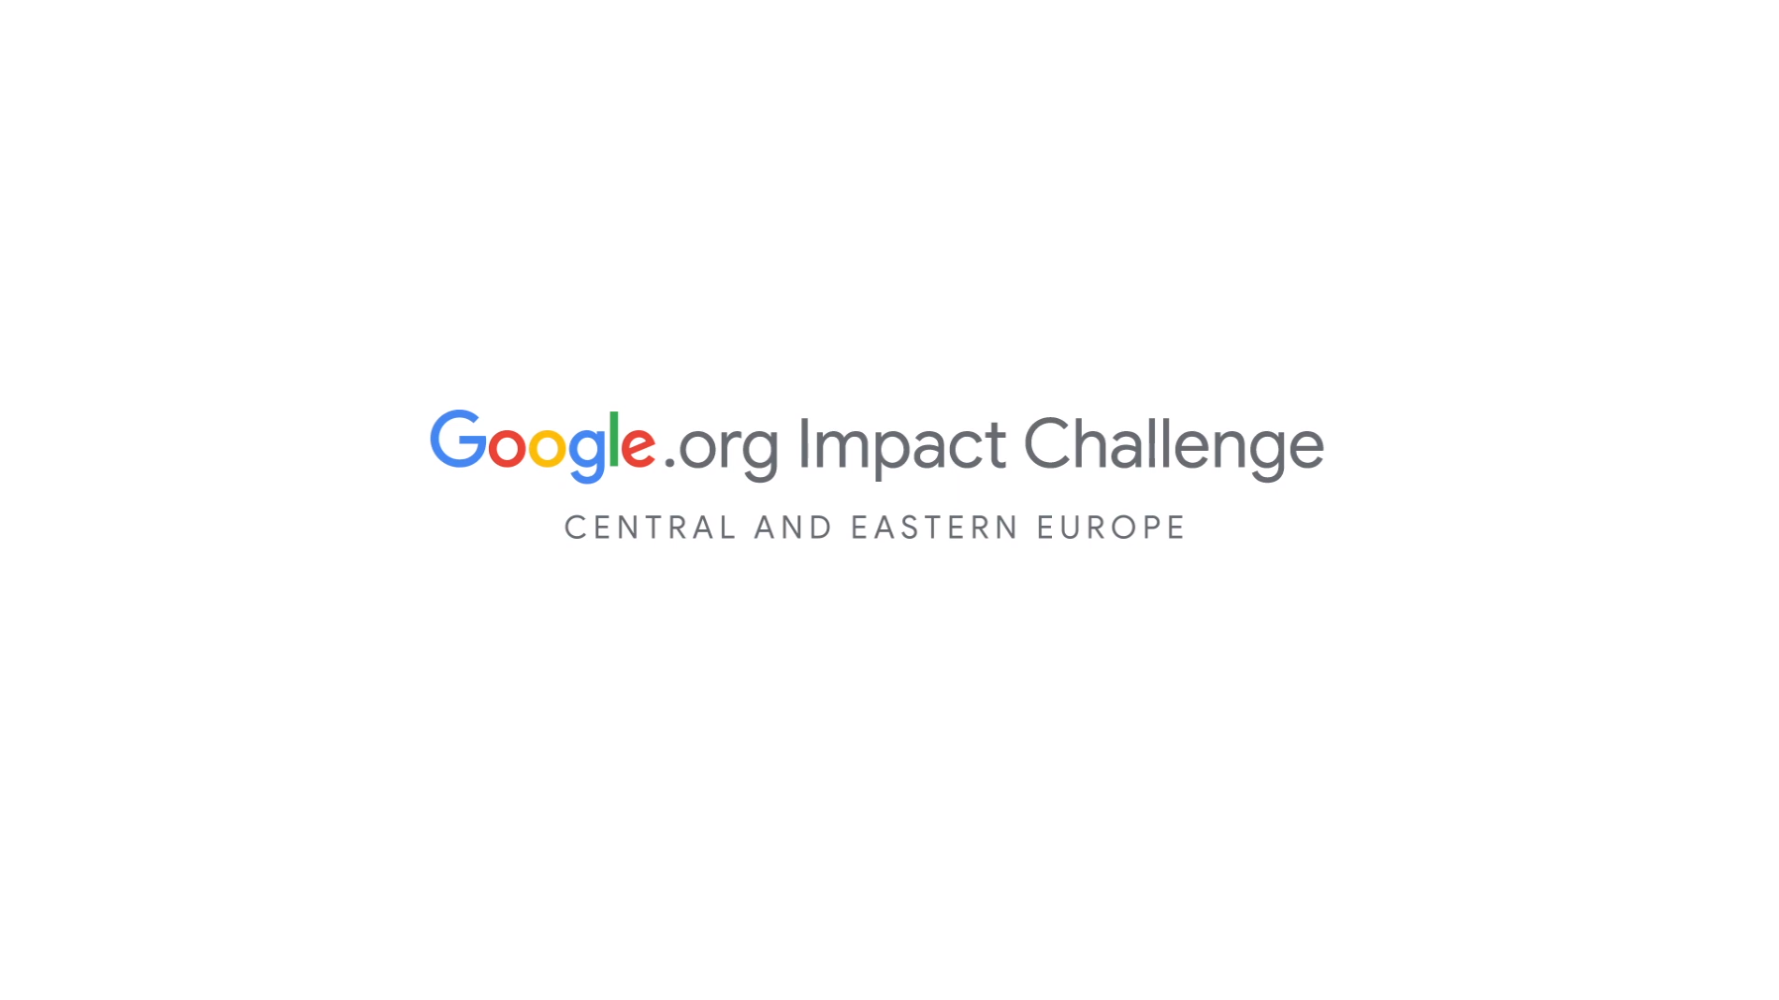 Google lansează competiția Google.org Impact Challenge